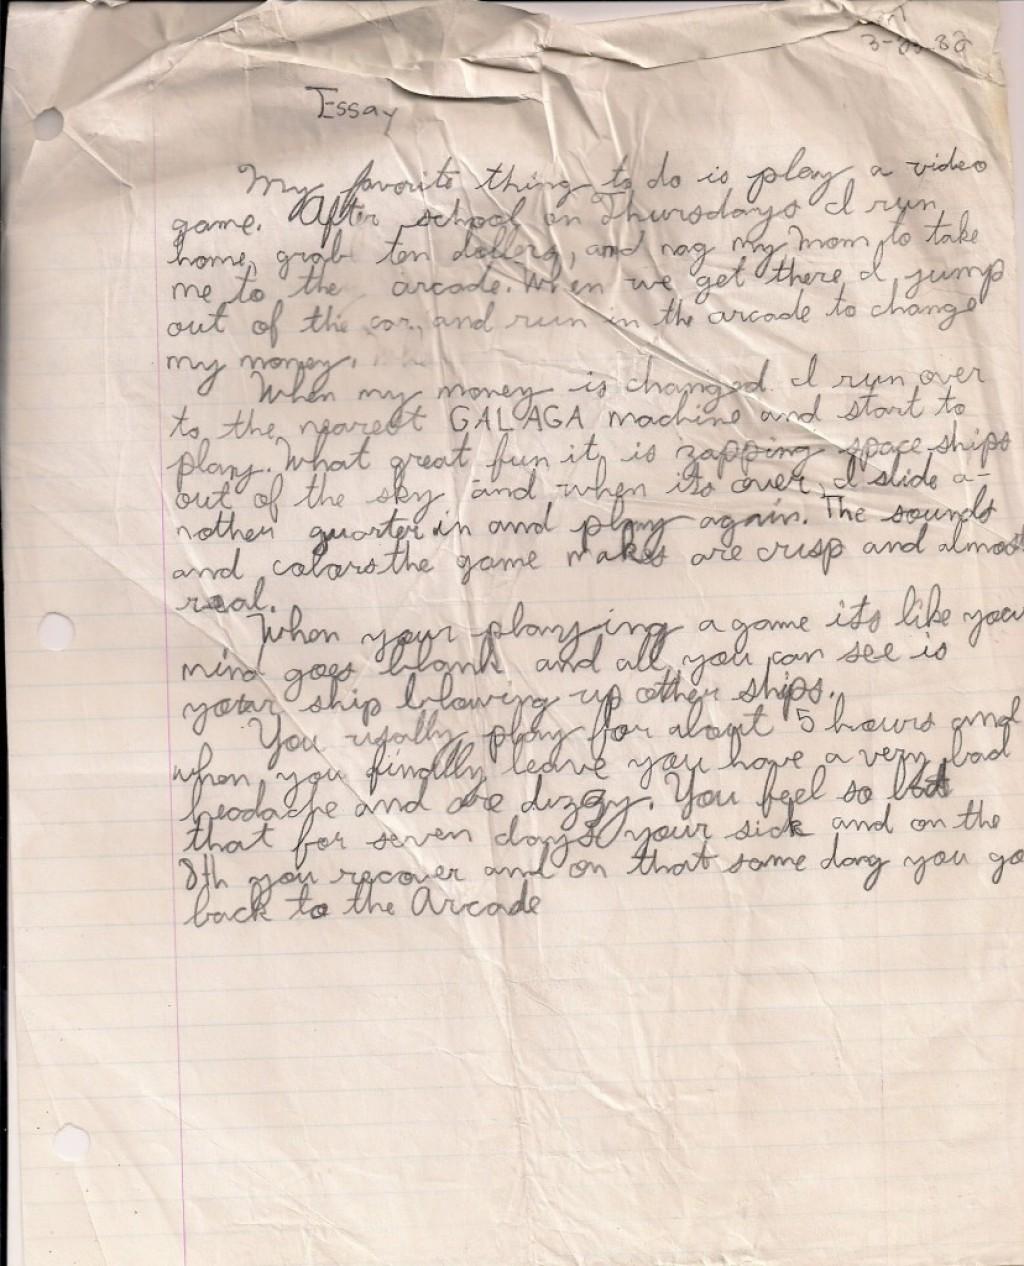 013 My Hobby Essay Example Videogameessay1982 Impressive In Urdu Class 7 Hindi Cricket Marathi Large